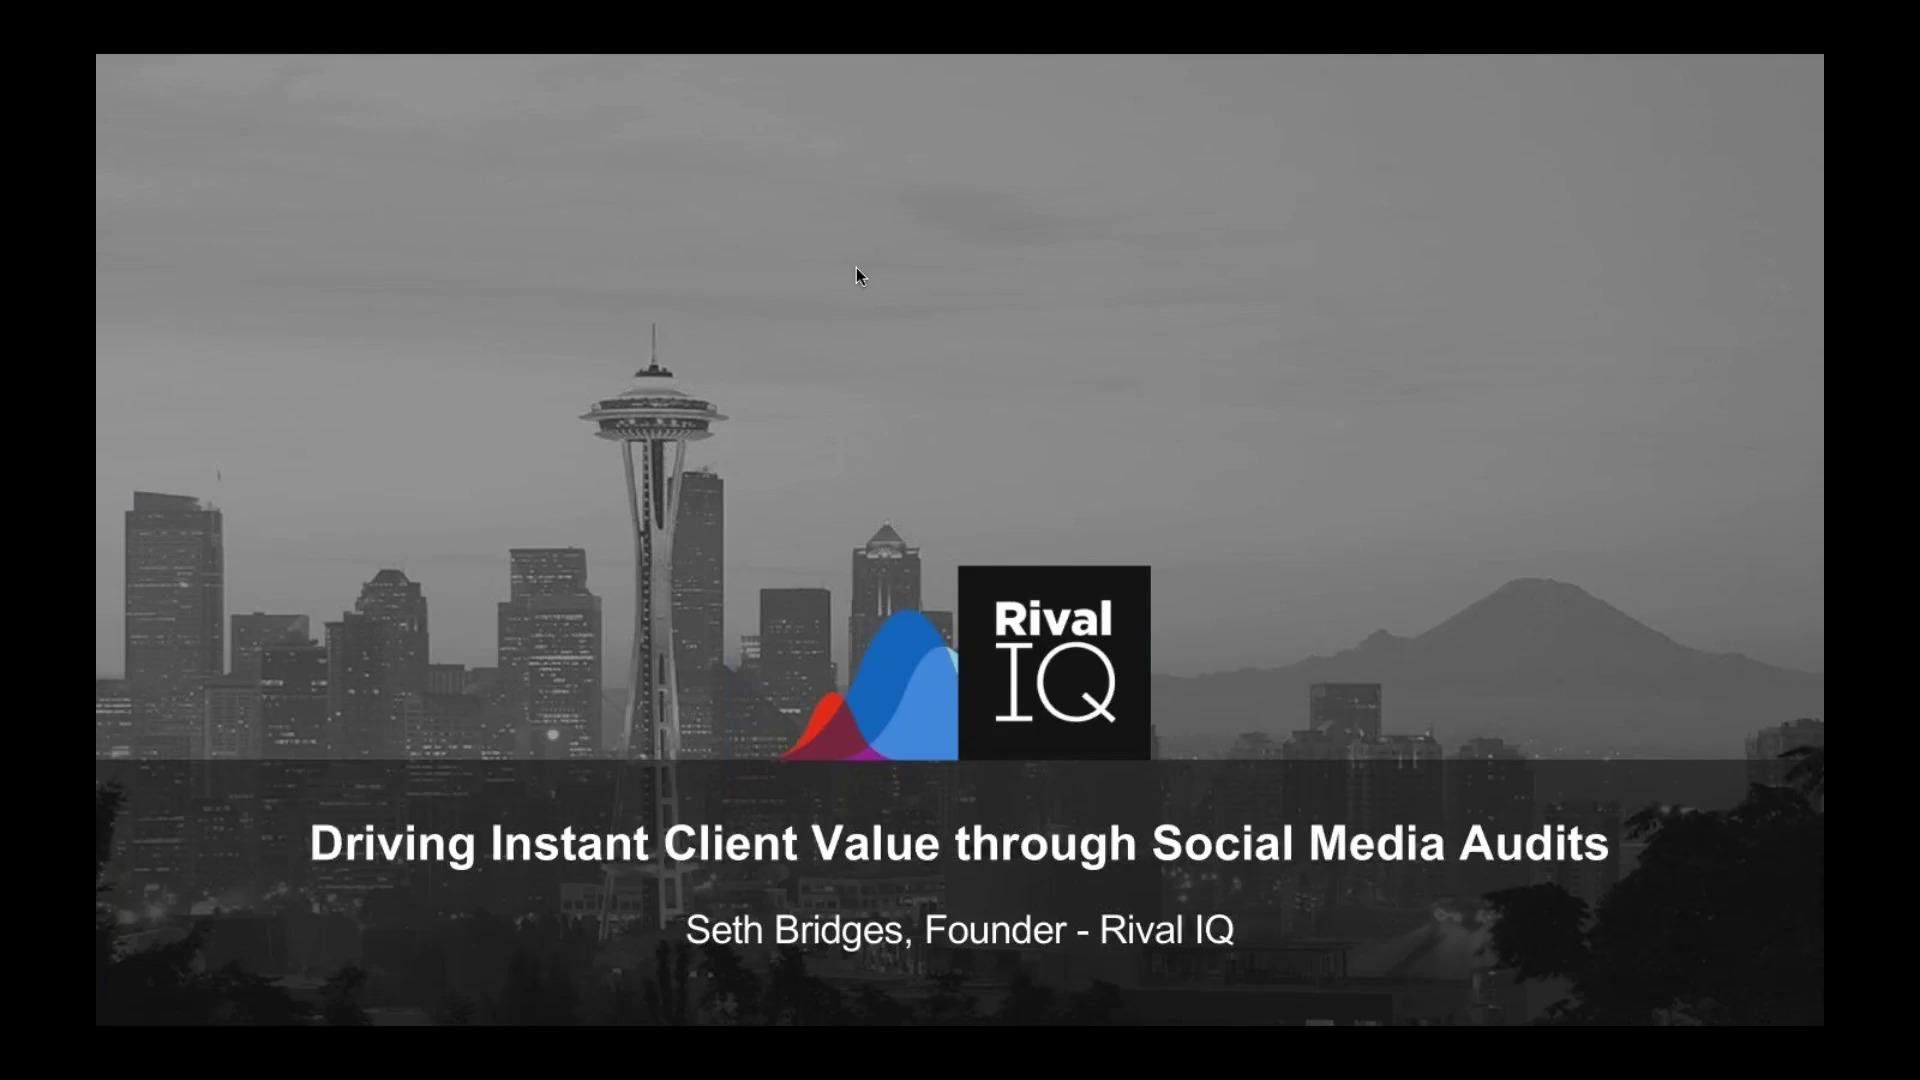 Driving Instant Client Value through Social Media Audits